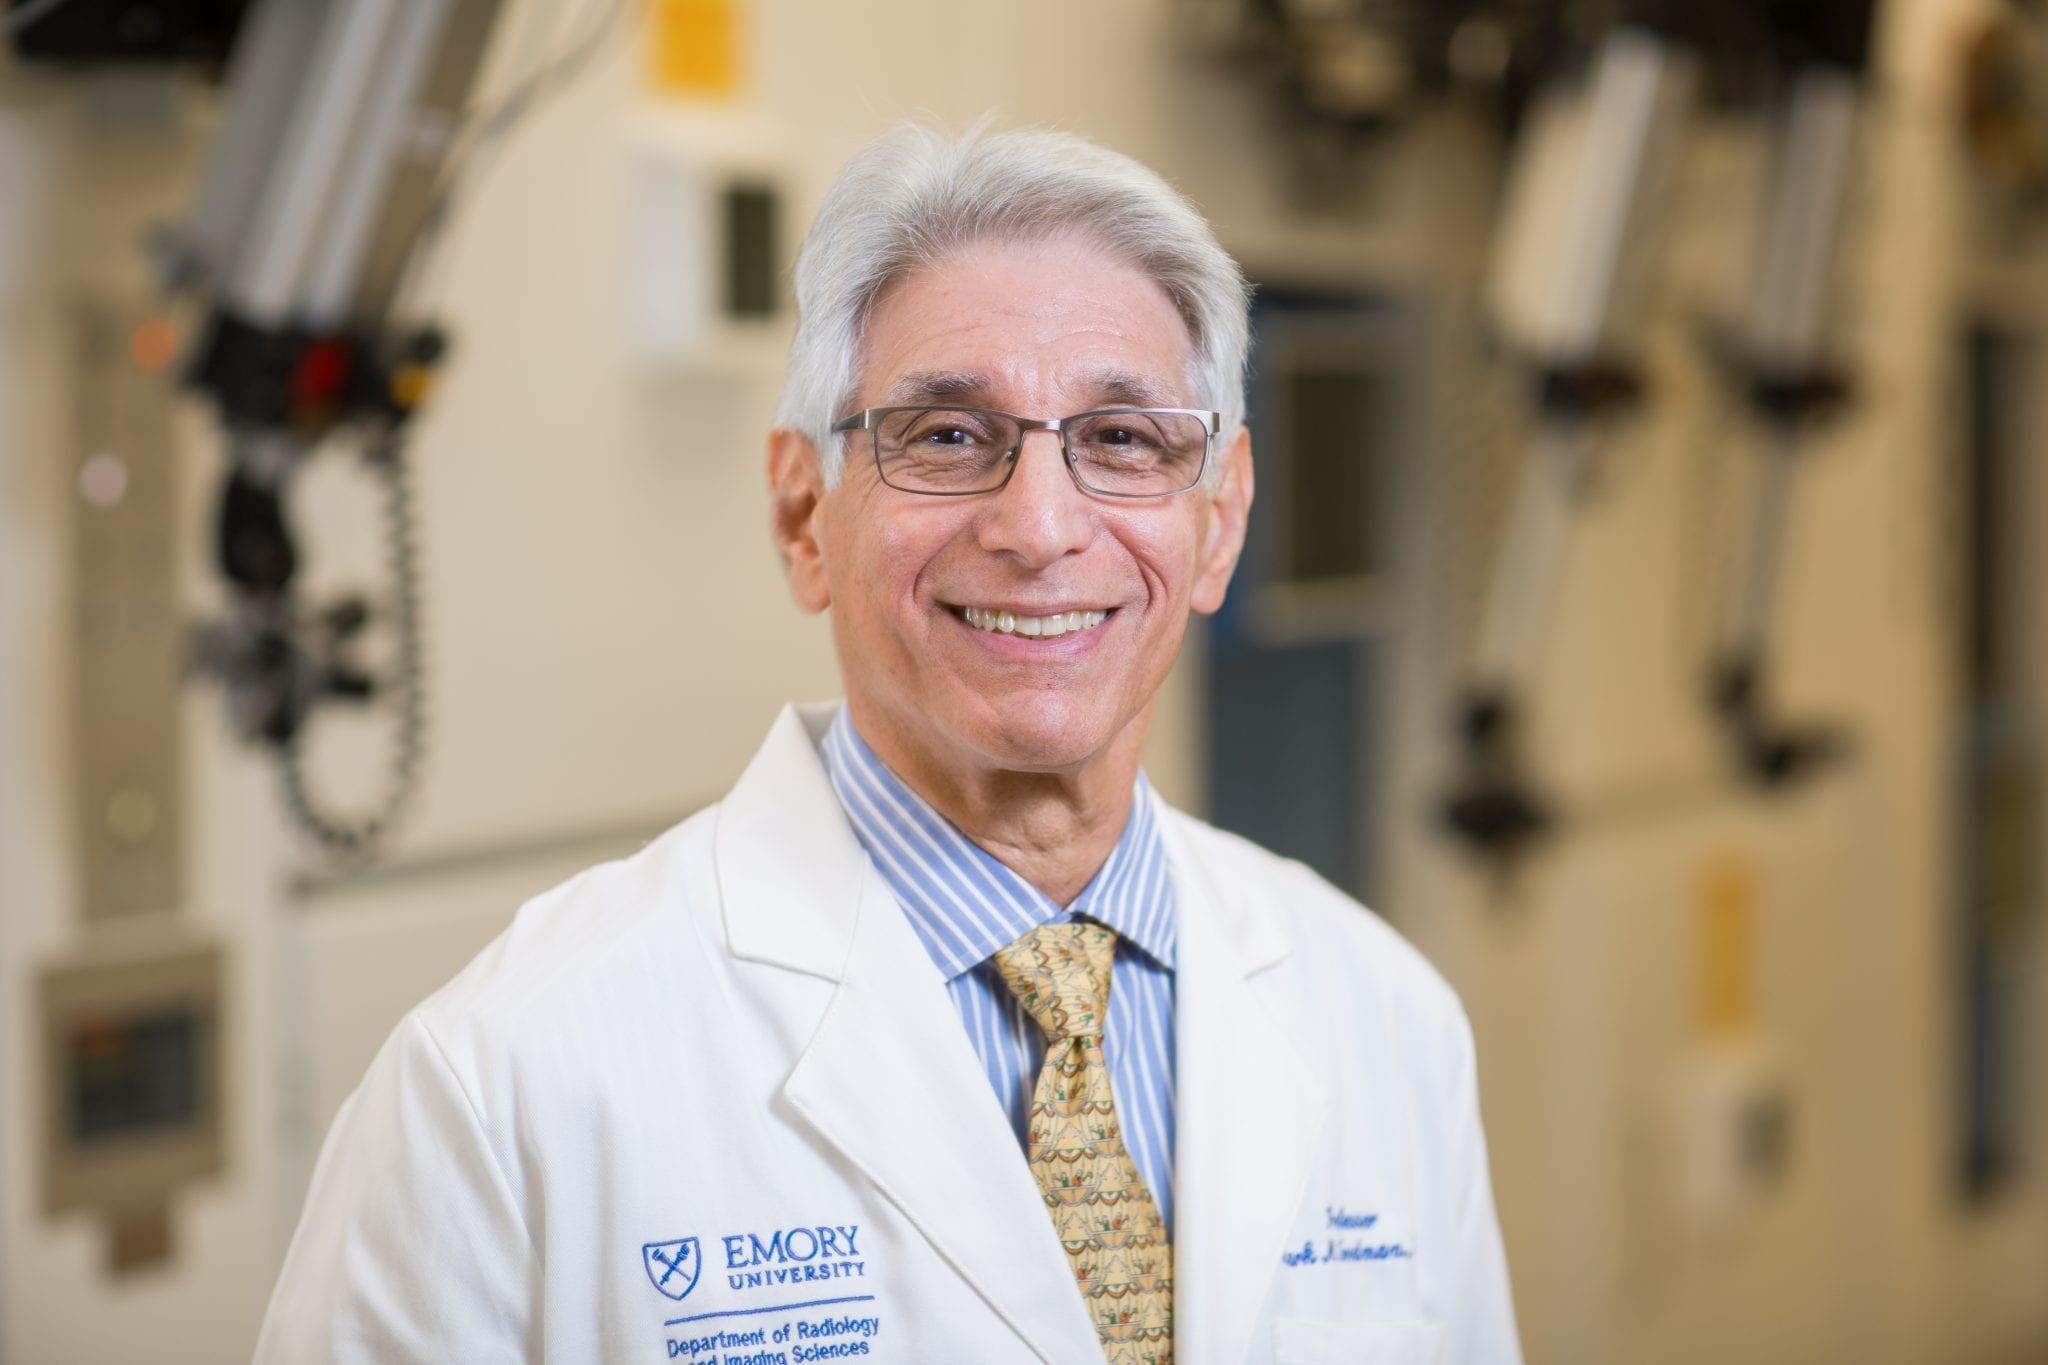 Dr. Mark Goodman